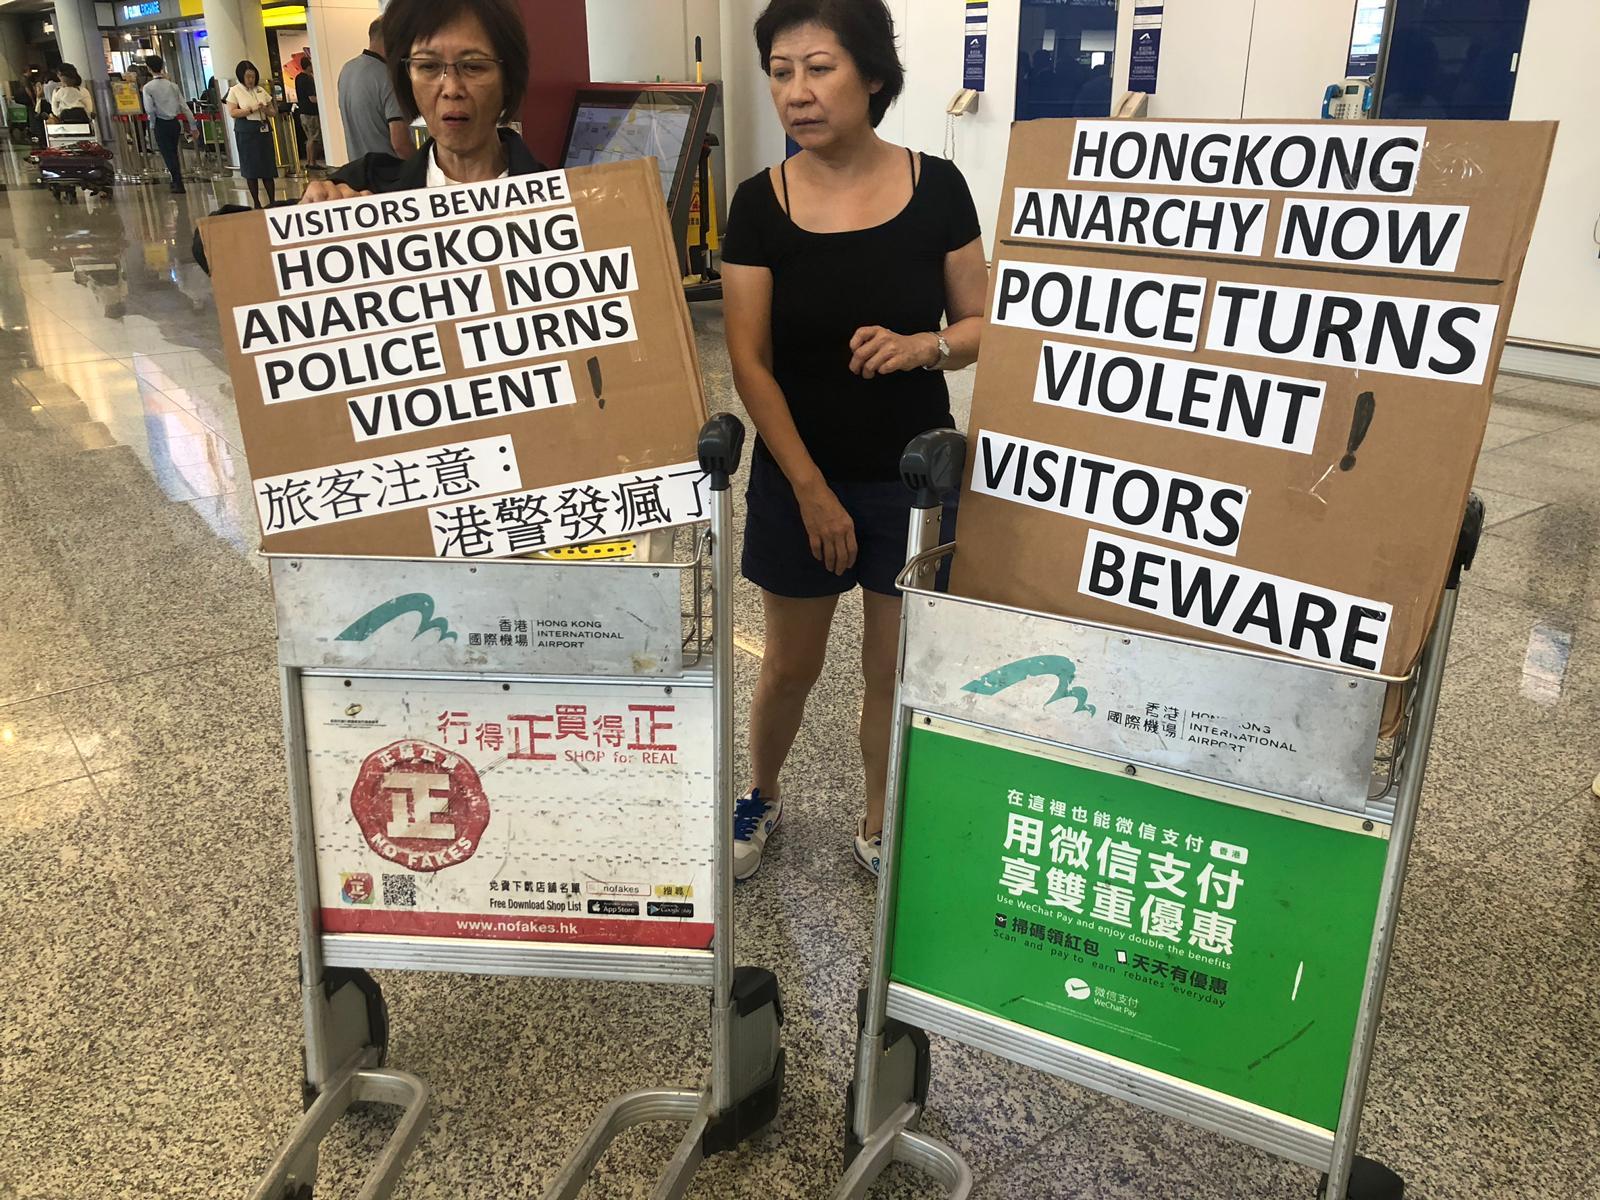 Protesters hoist signs onto luggage carts at Hong Kong's airport.